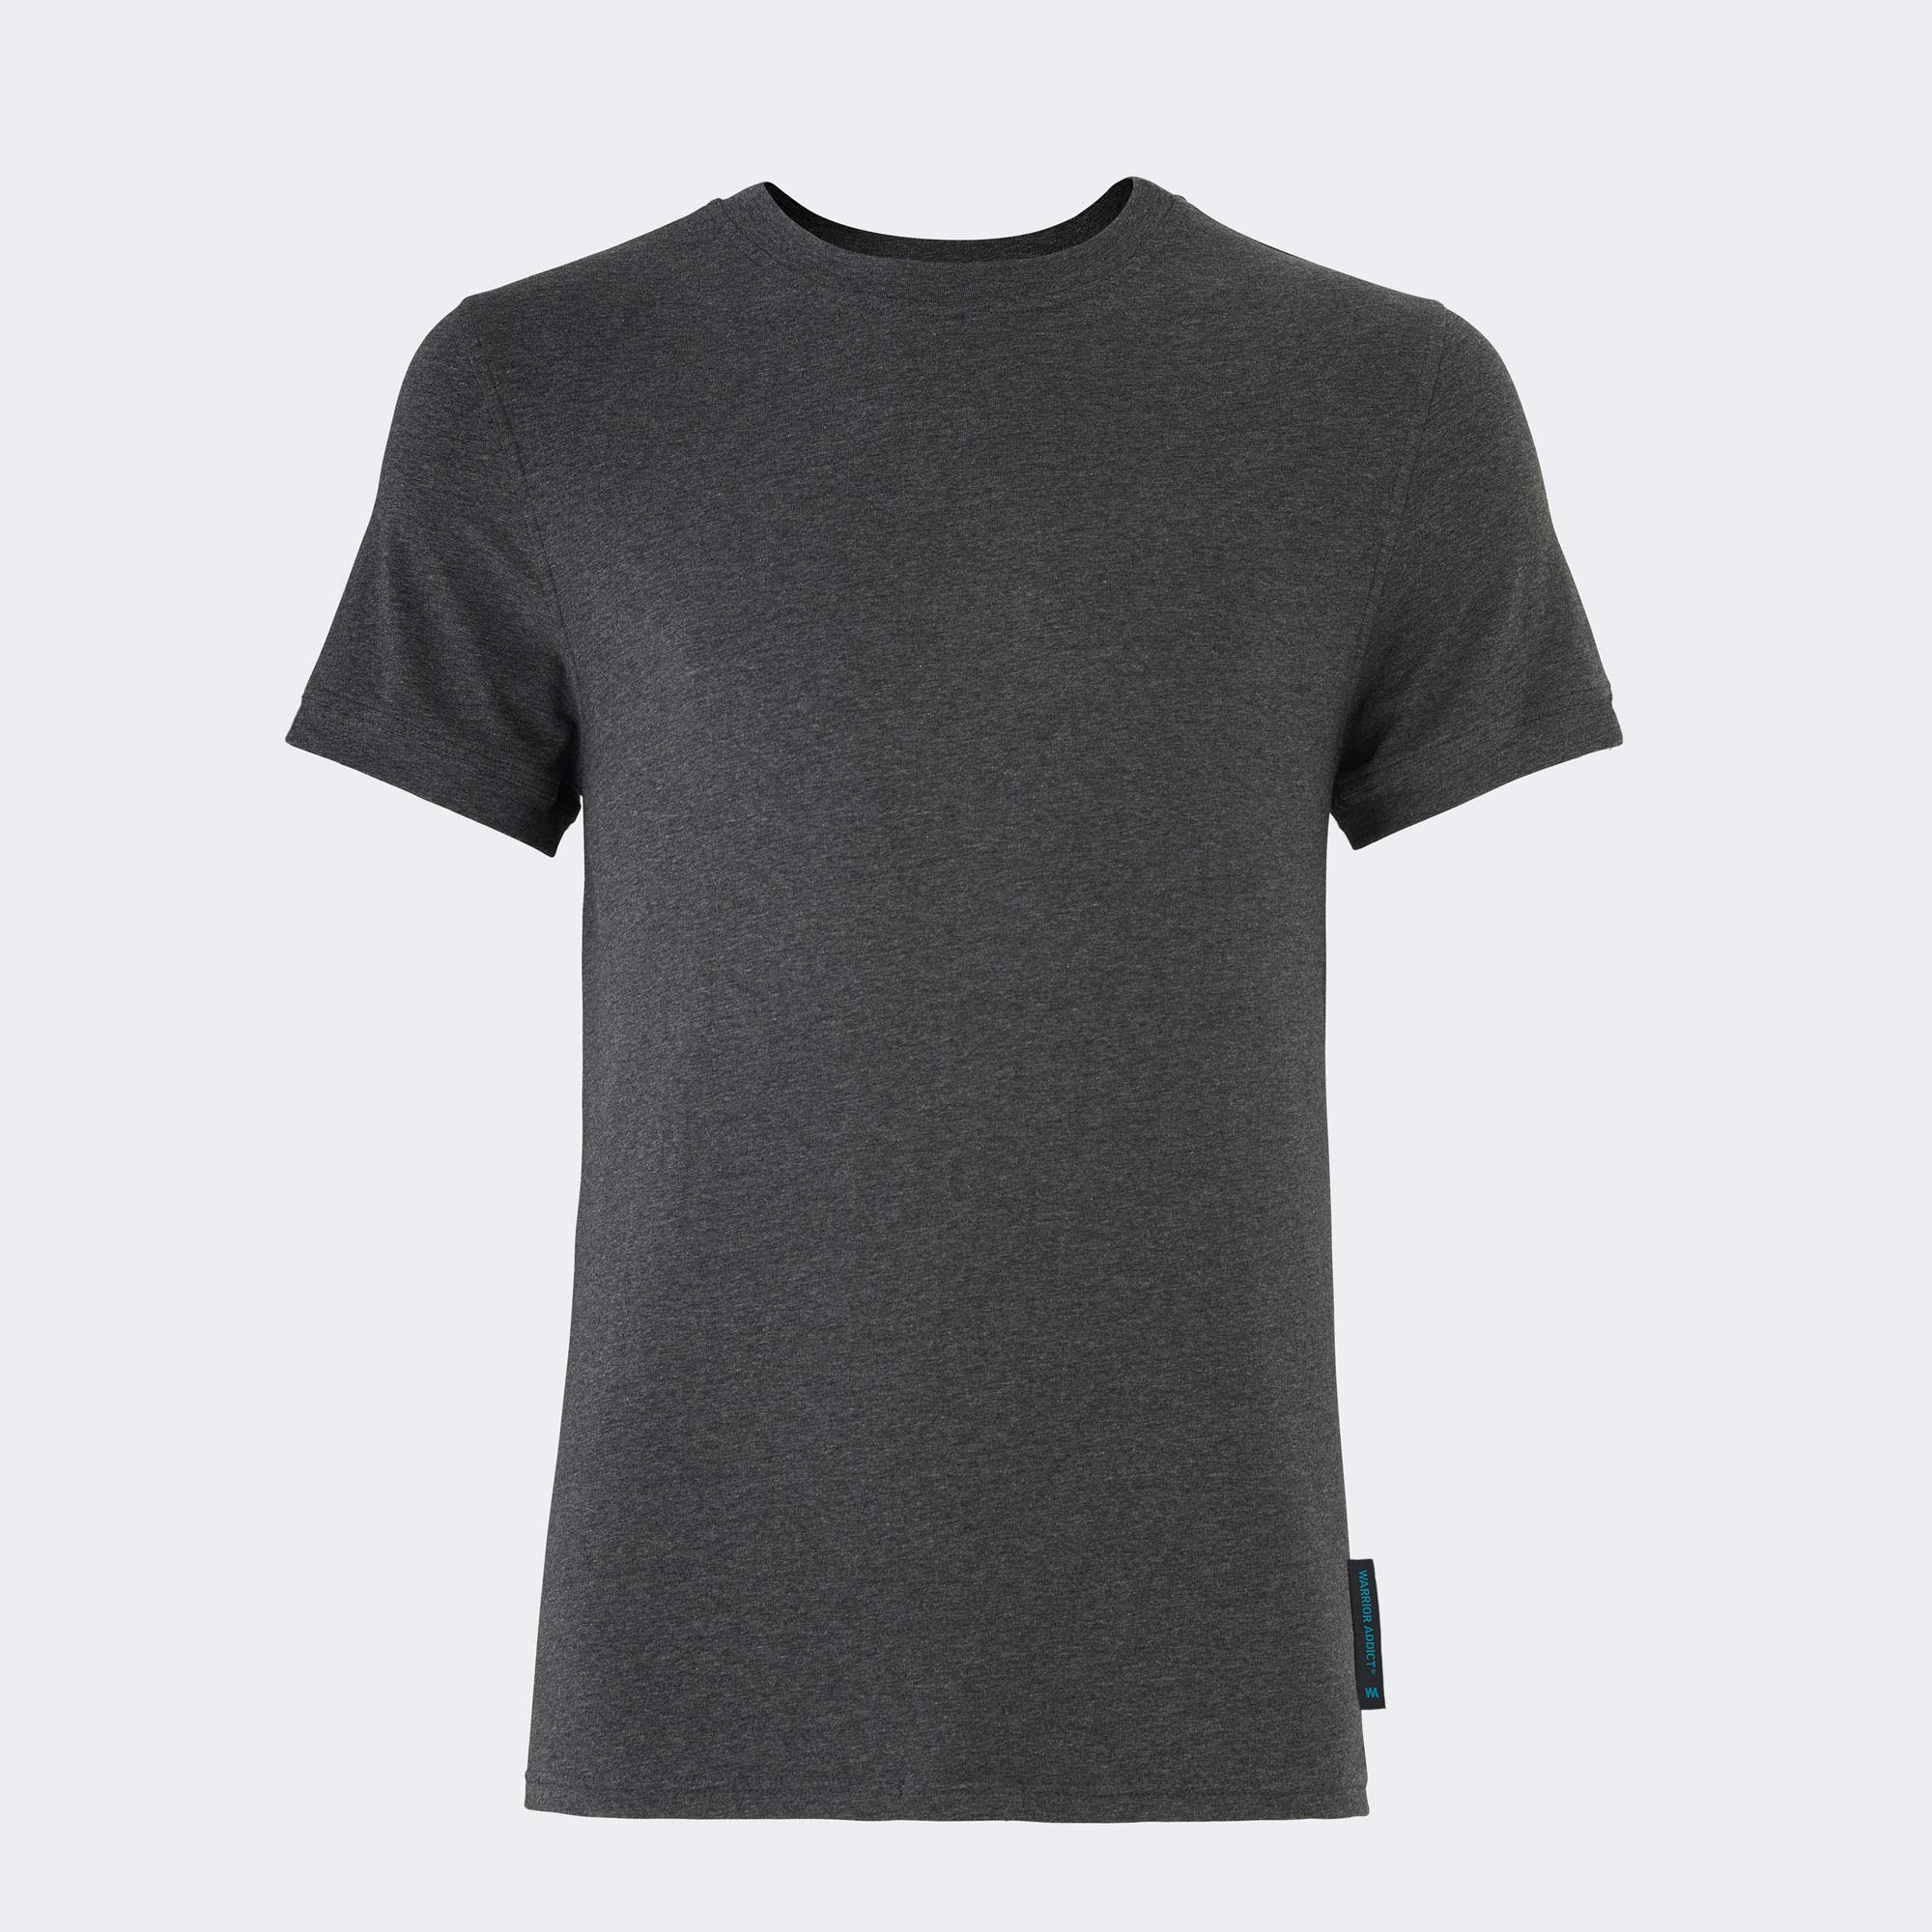 Warrior addict grey mens yoga performance t-shirt front view